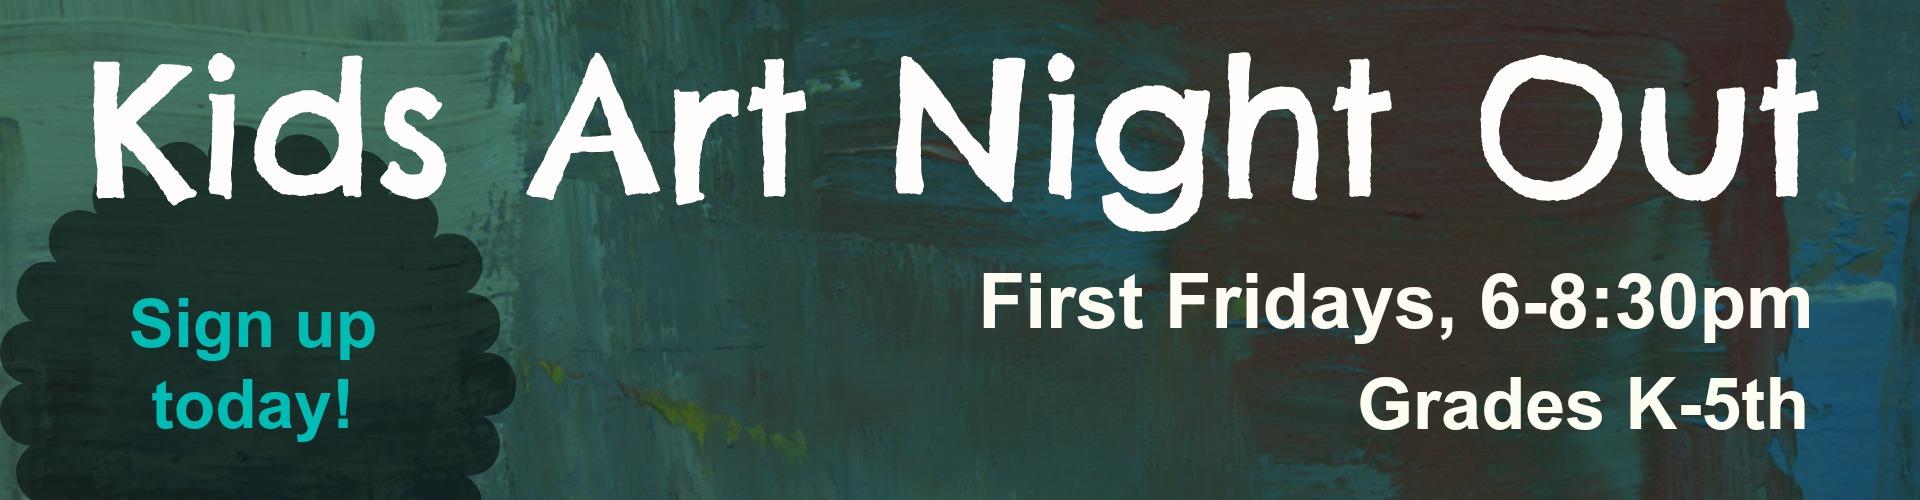 Kids Art Night Out - First Friday Art Workshops